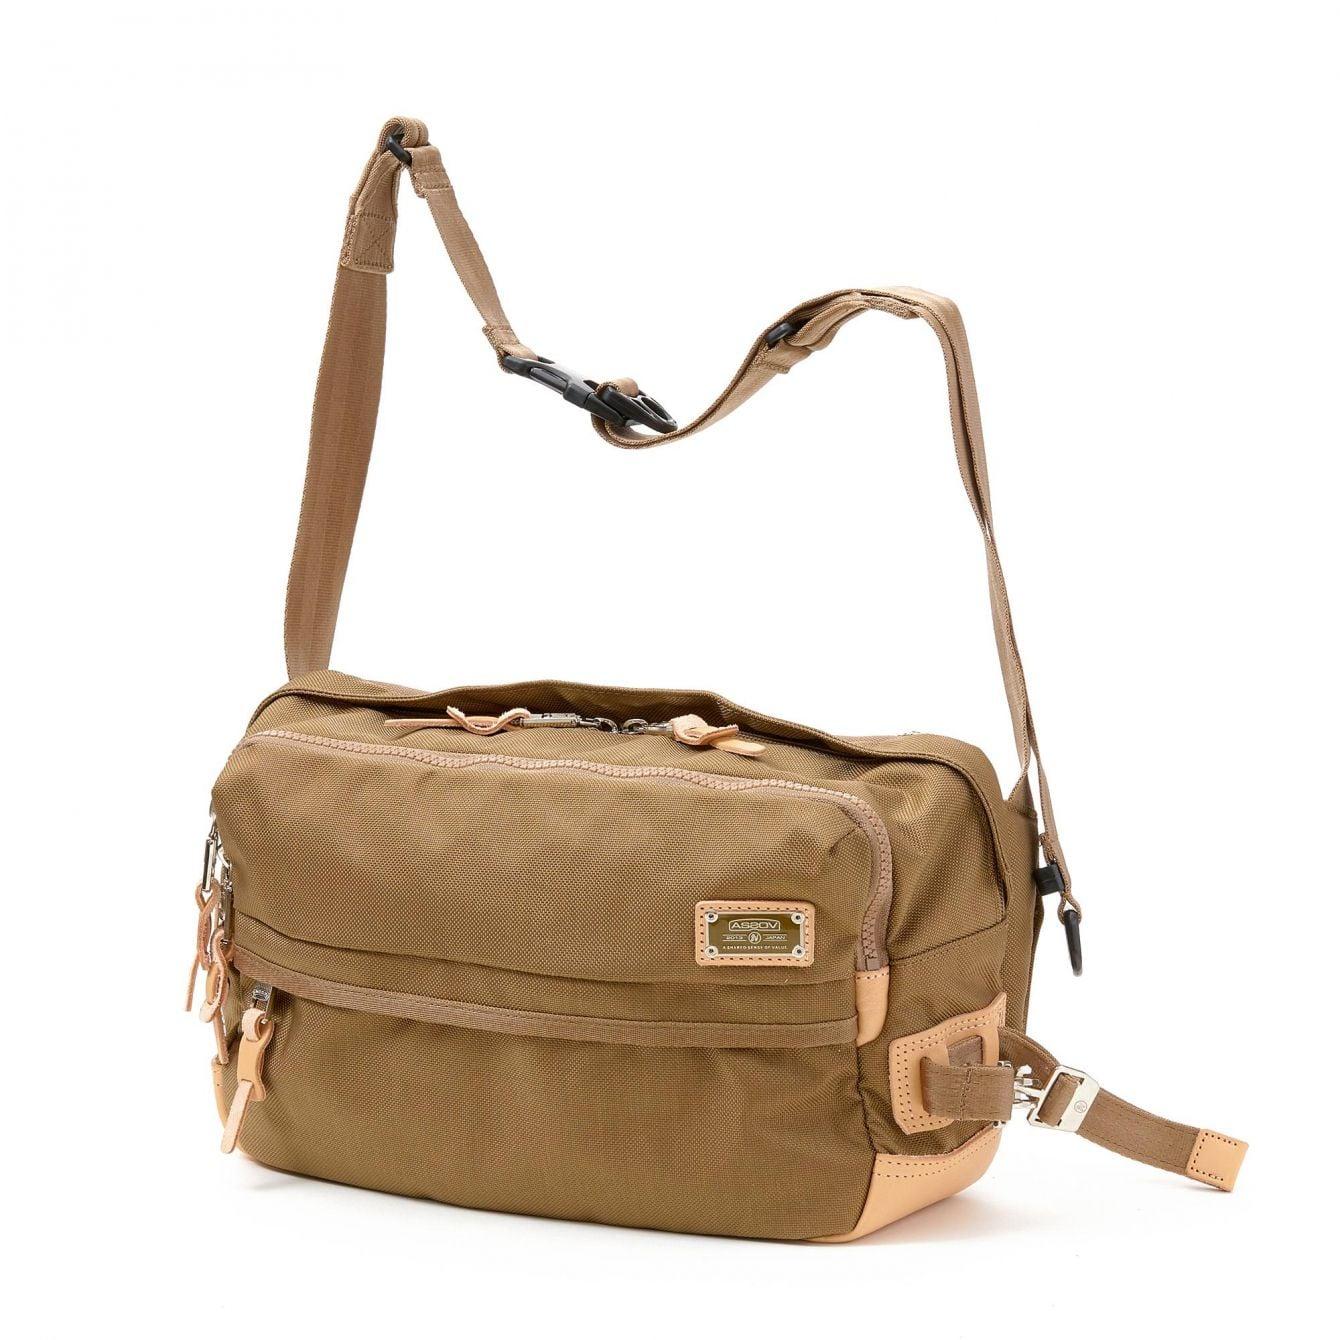 # 「AS2OV」包袋品牌獨家彈道尼龍:2WAY SHOULDER & BODY BAG 新品上市 4